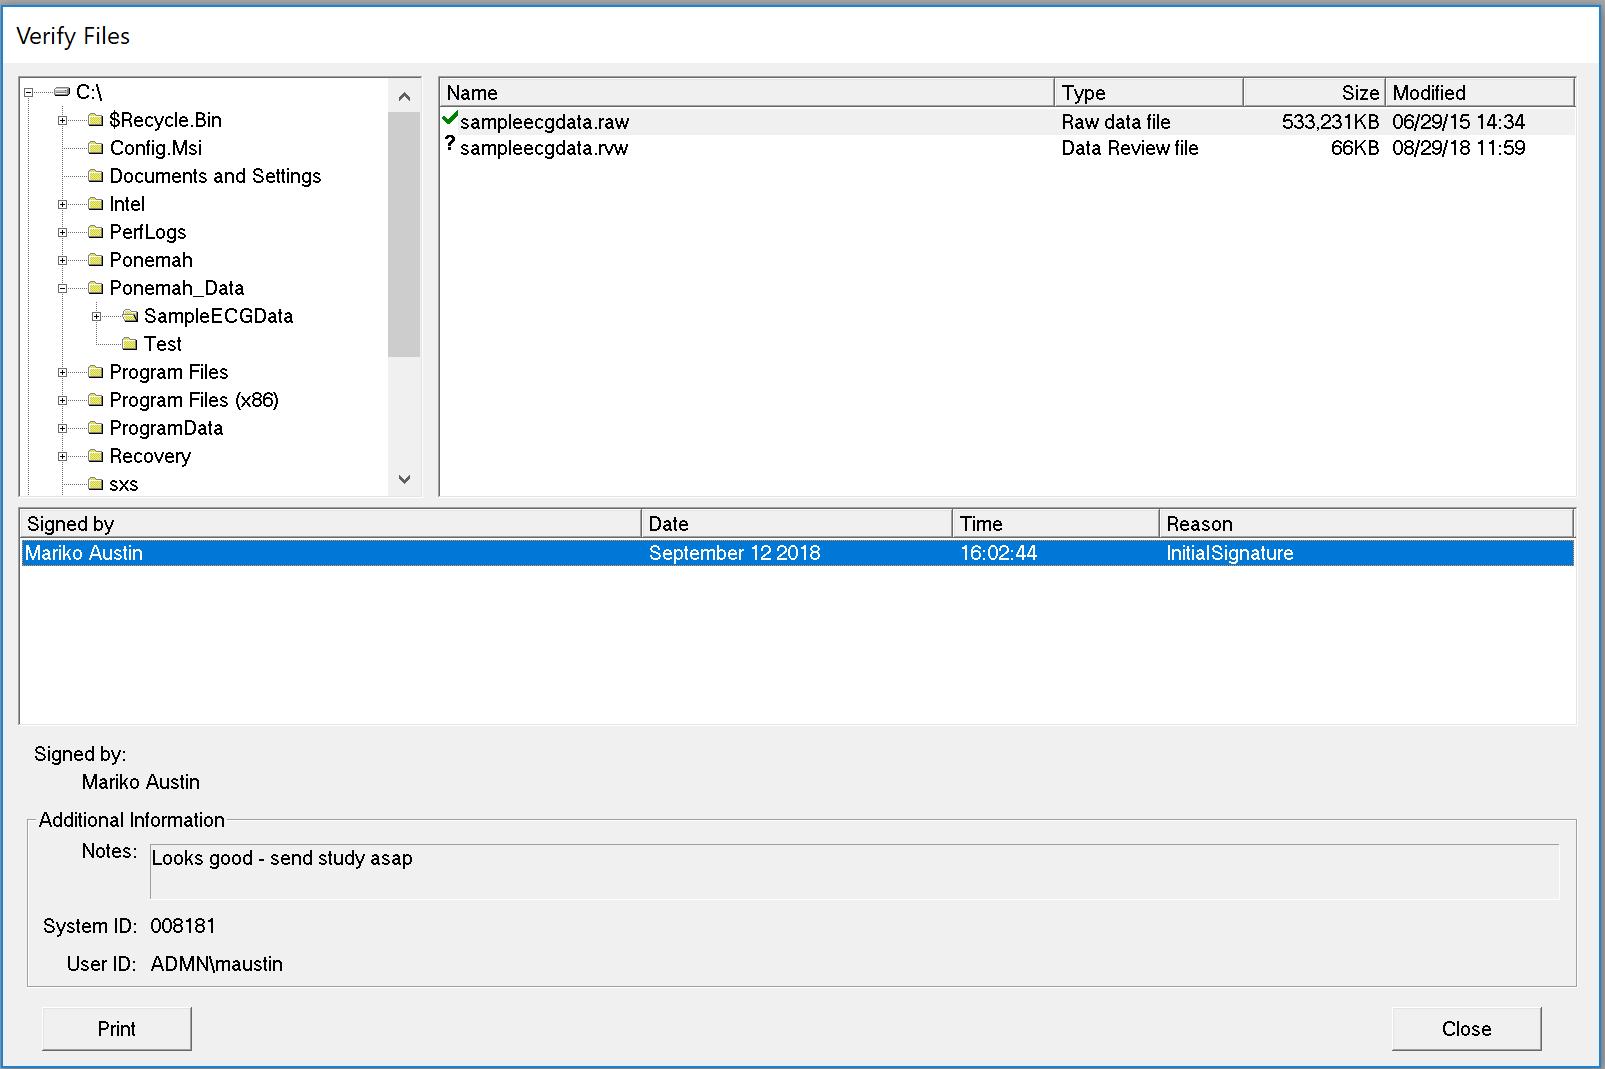 Data Security Option For Ponemah V530 Program 530 Verify Files